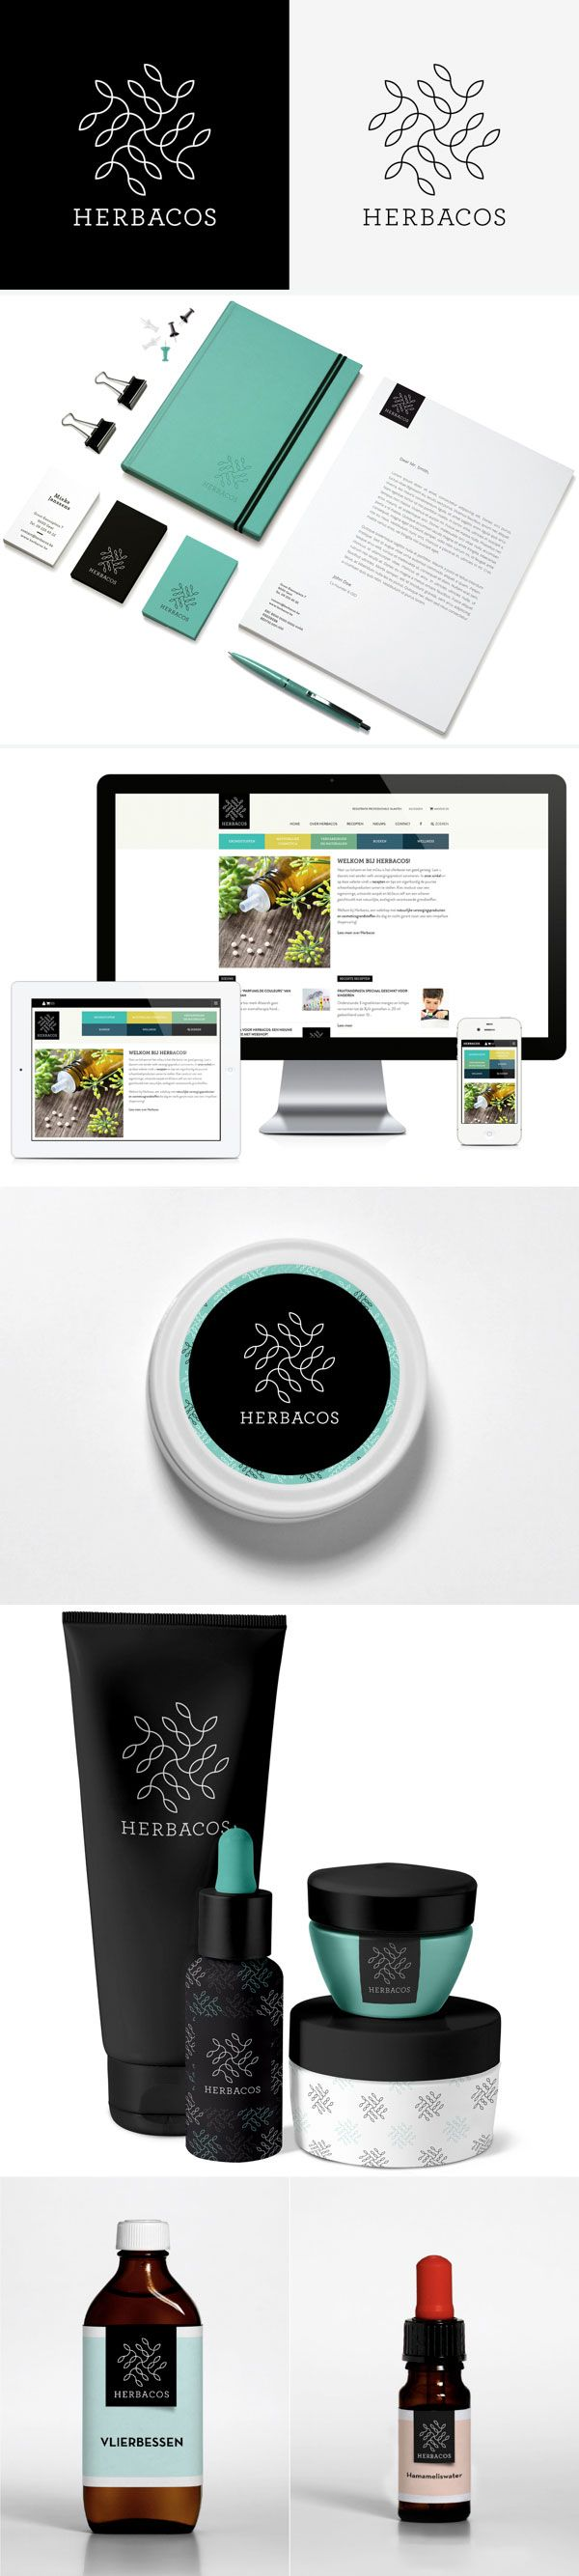 Herbacos – Canada Gent canada-gent.be